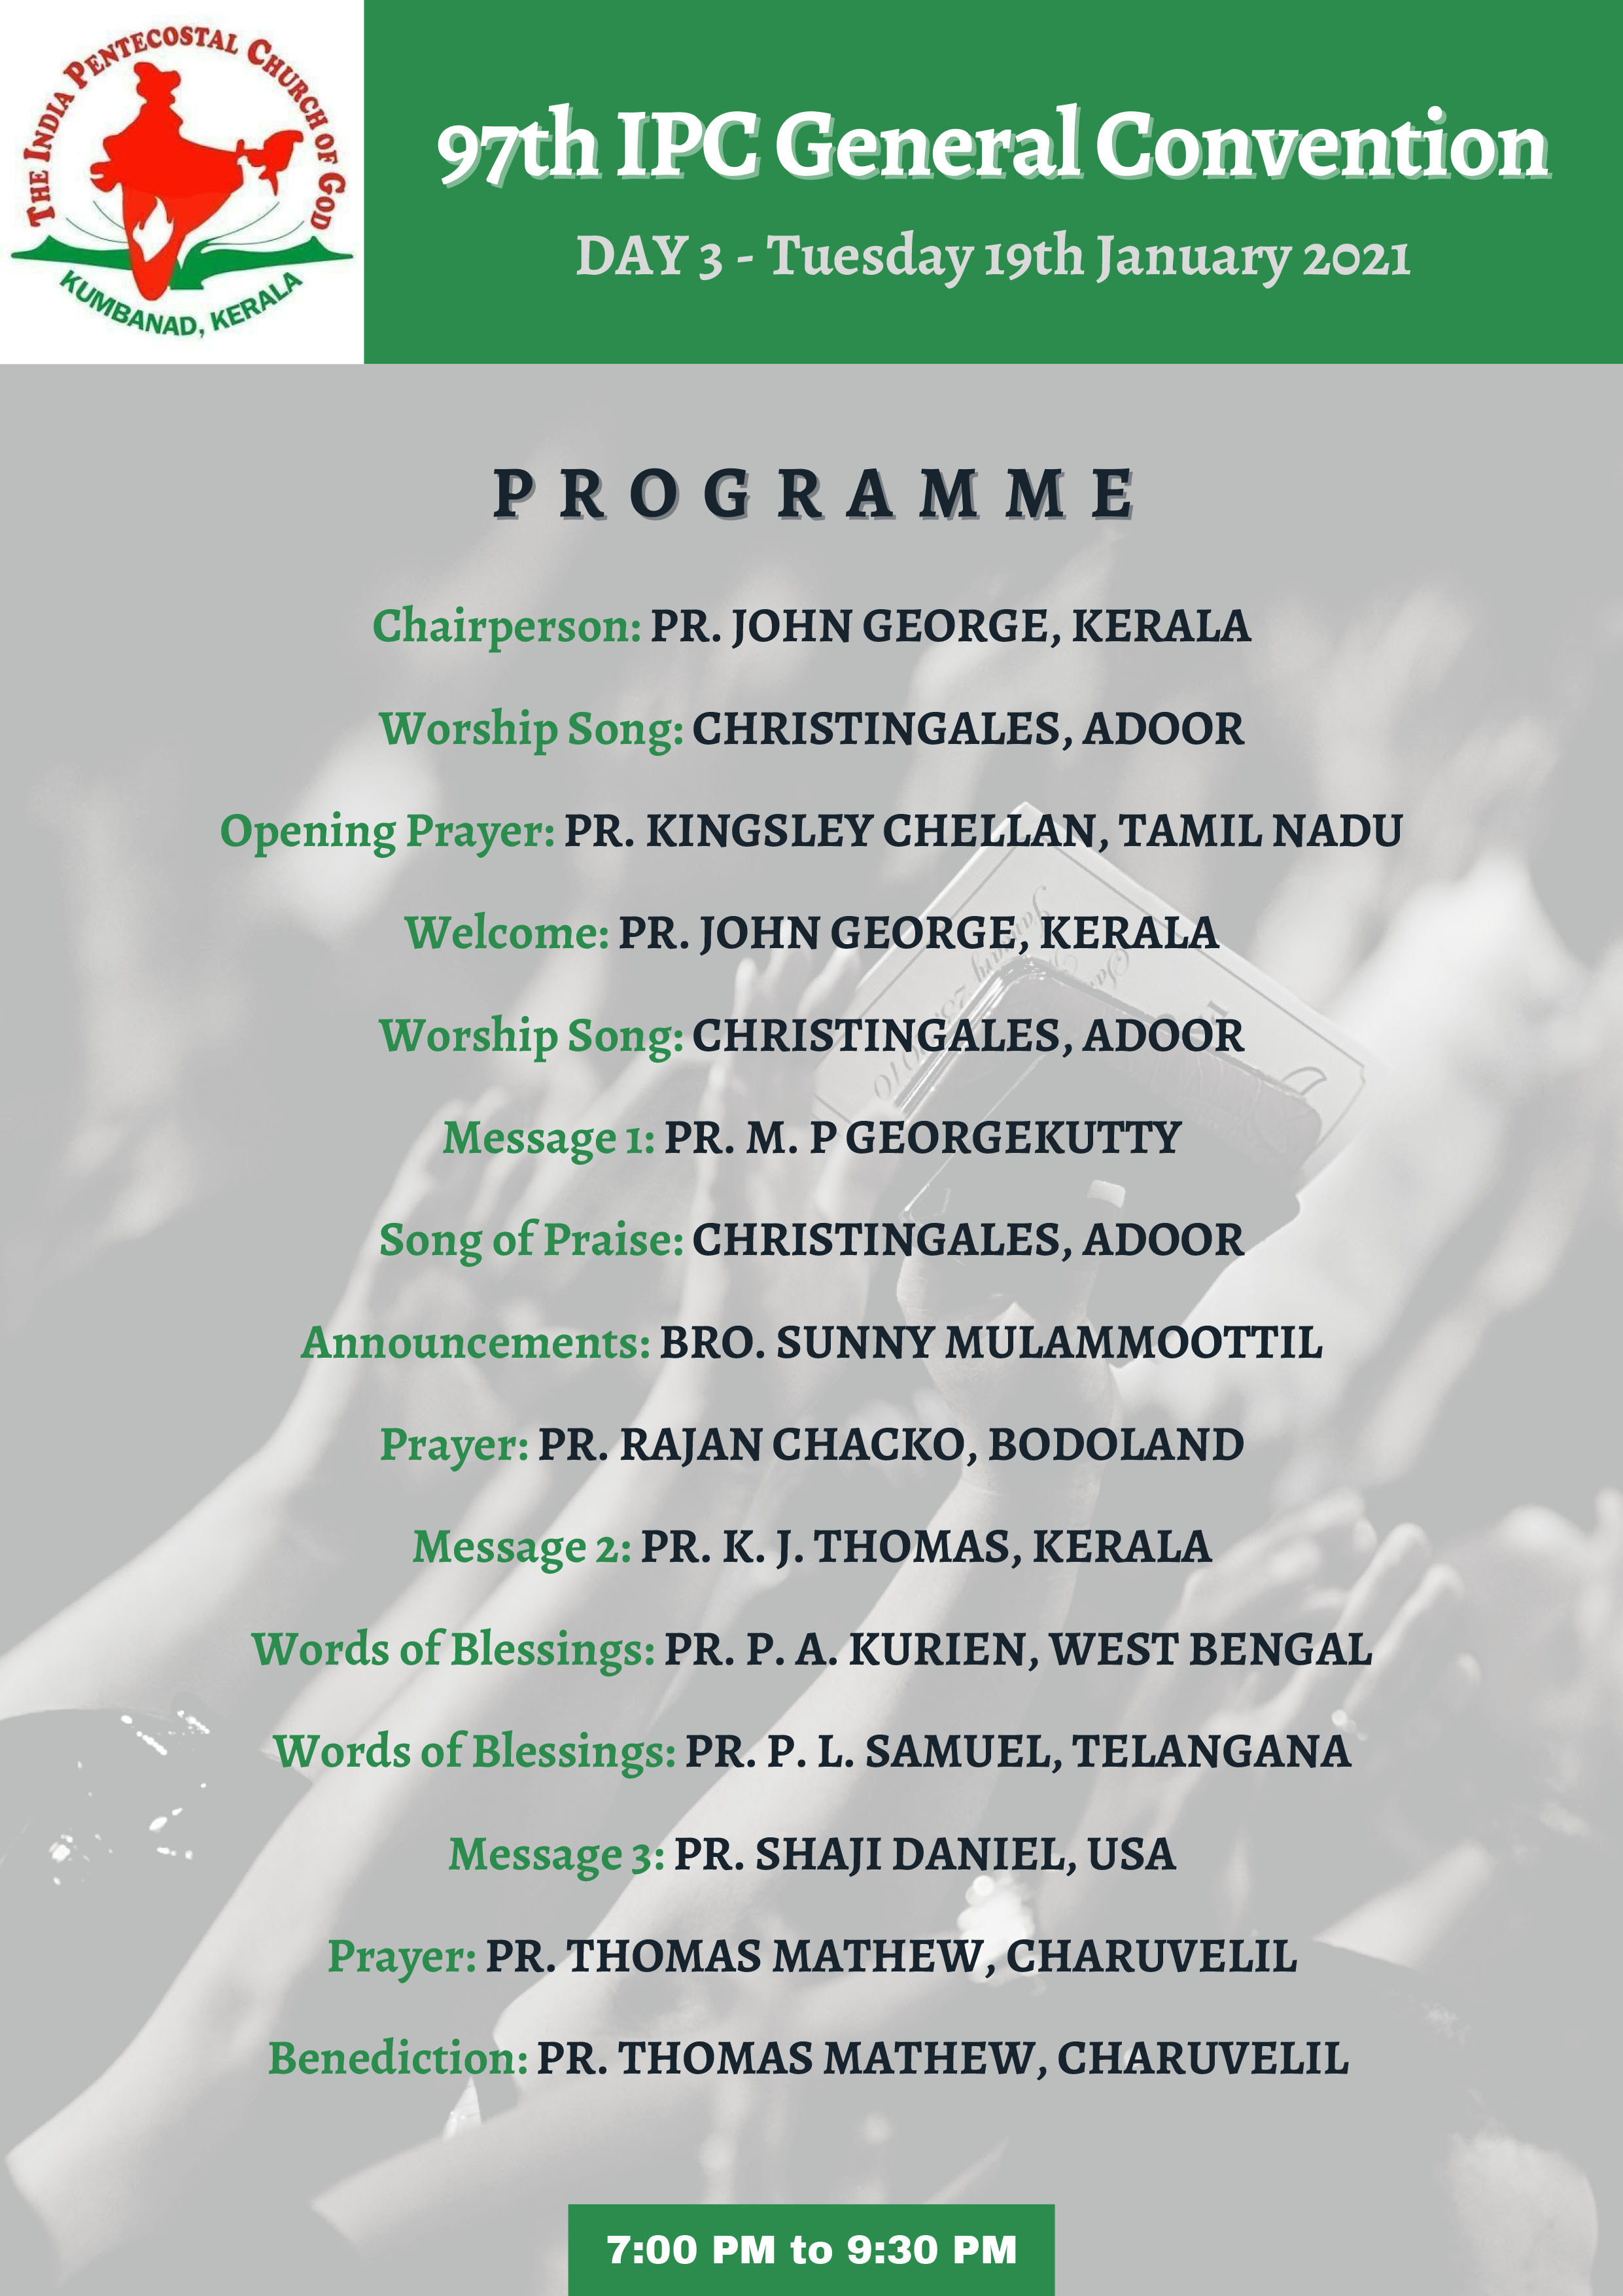 IPC-General-Convention-Day-3-Program